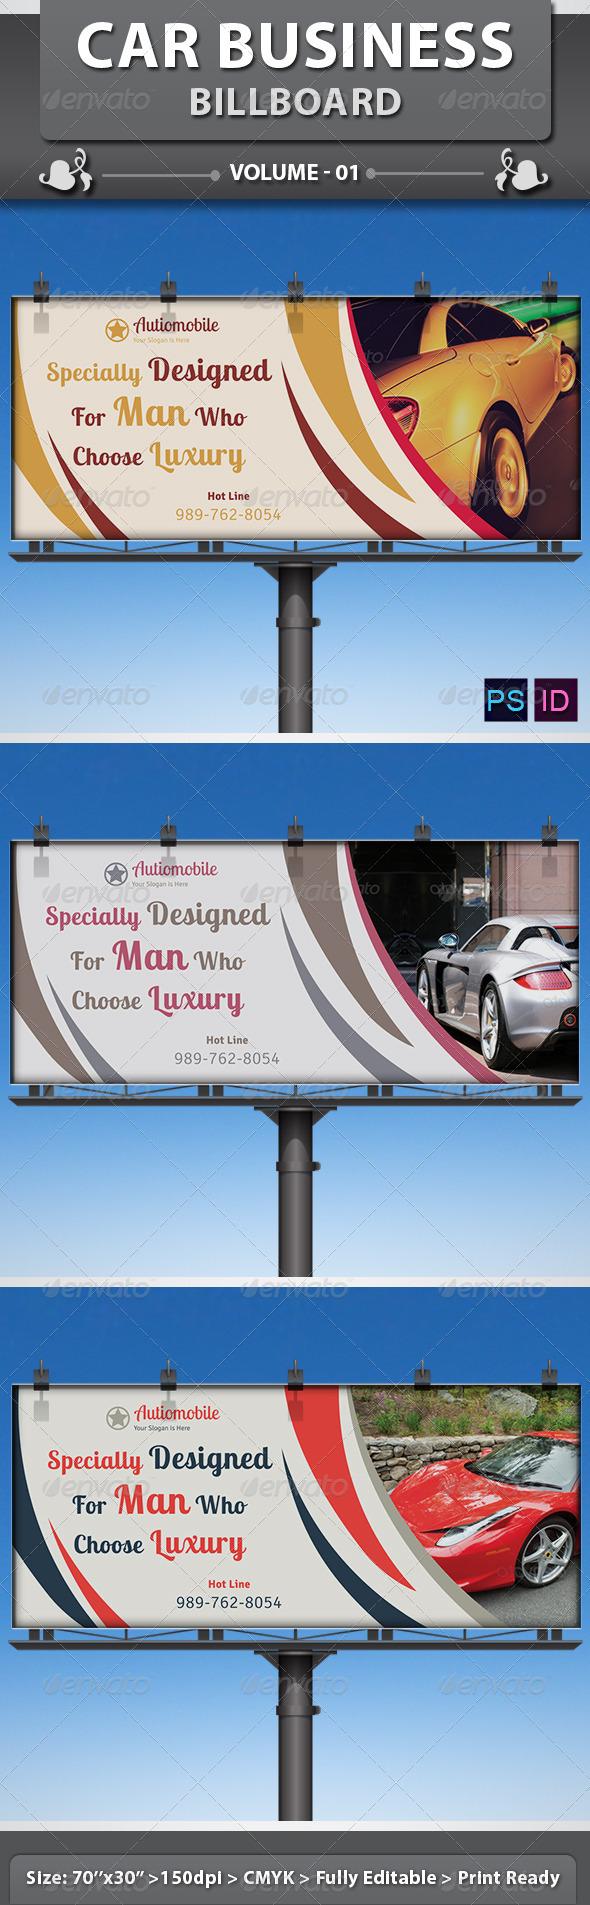 GraphicRiver Car Business Billboard v1 6421983